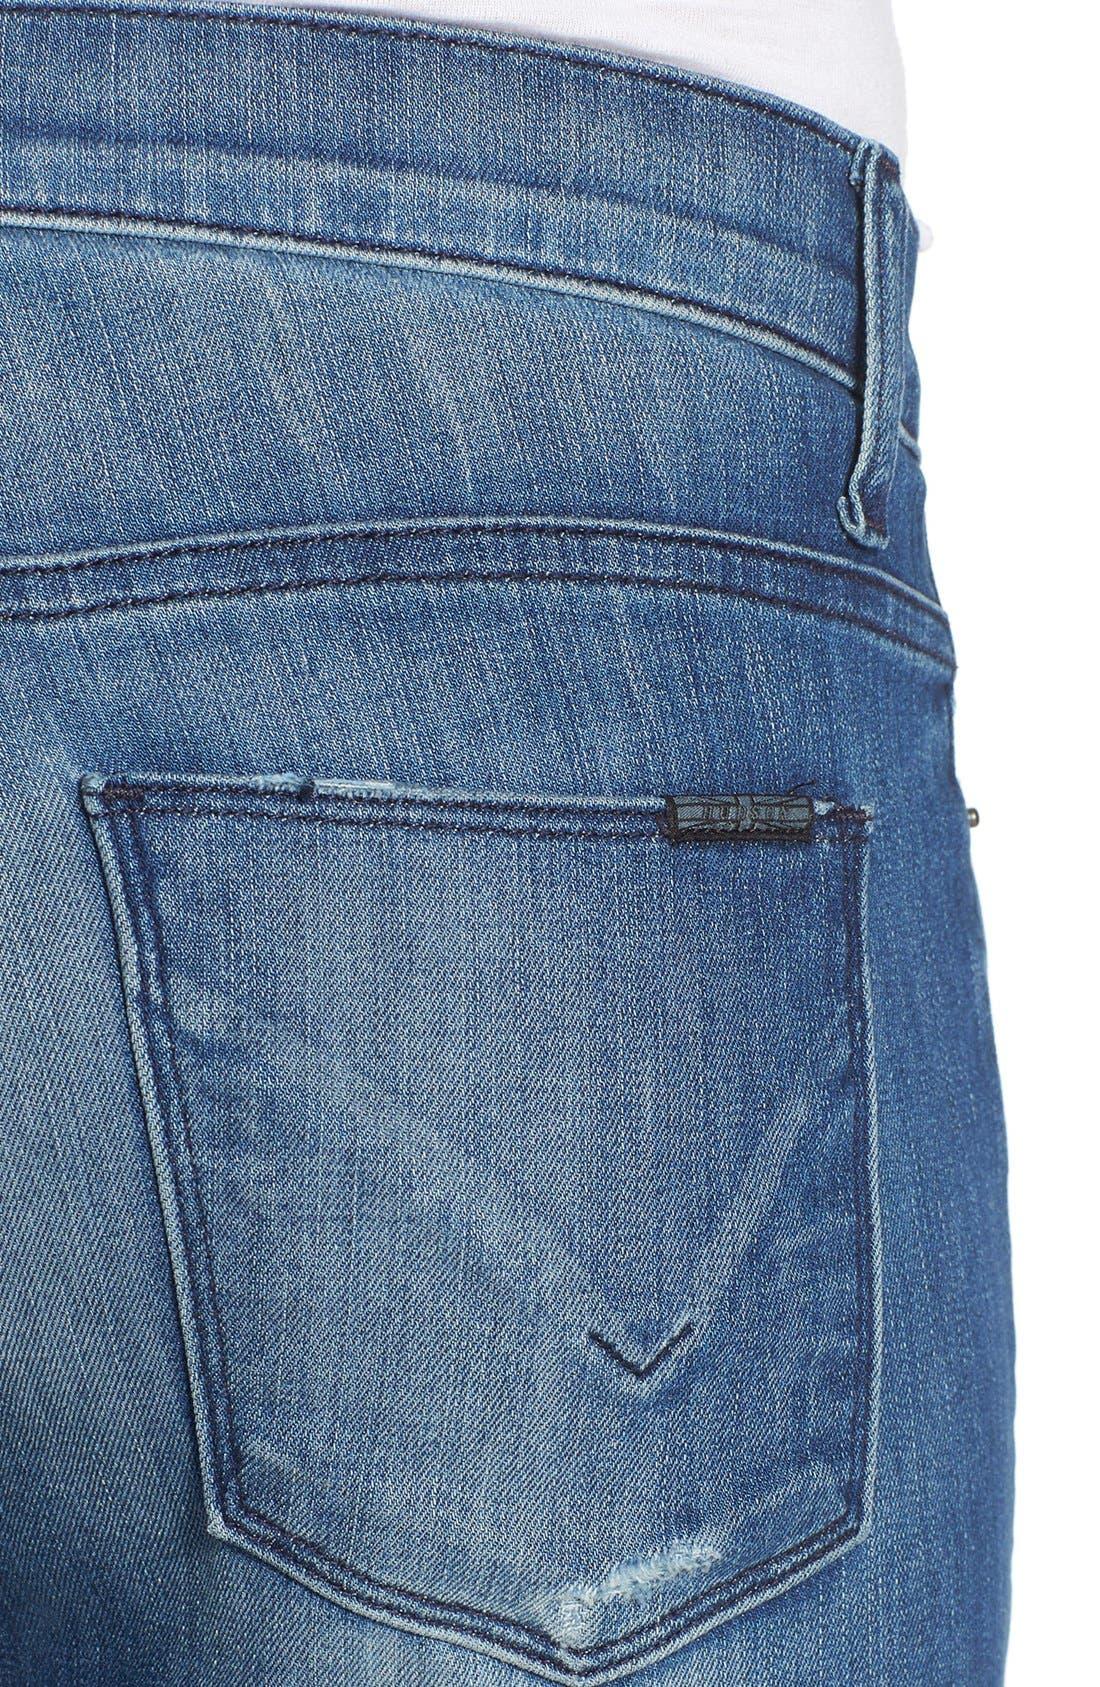 'Nico' Super Skinny Jeans,                             Alternate thumbnail 10, color,